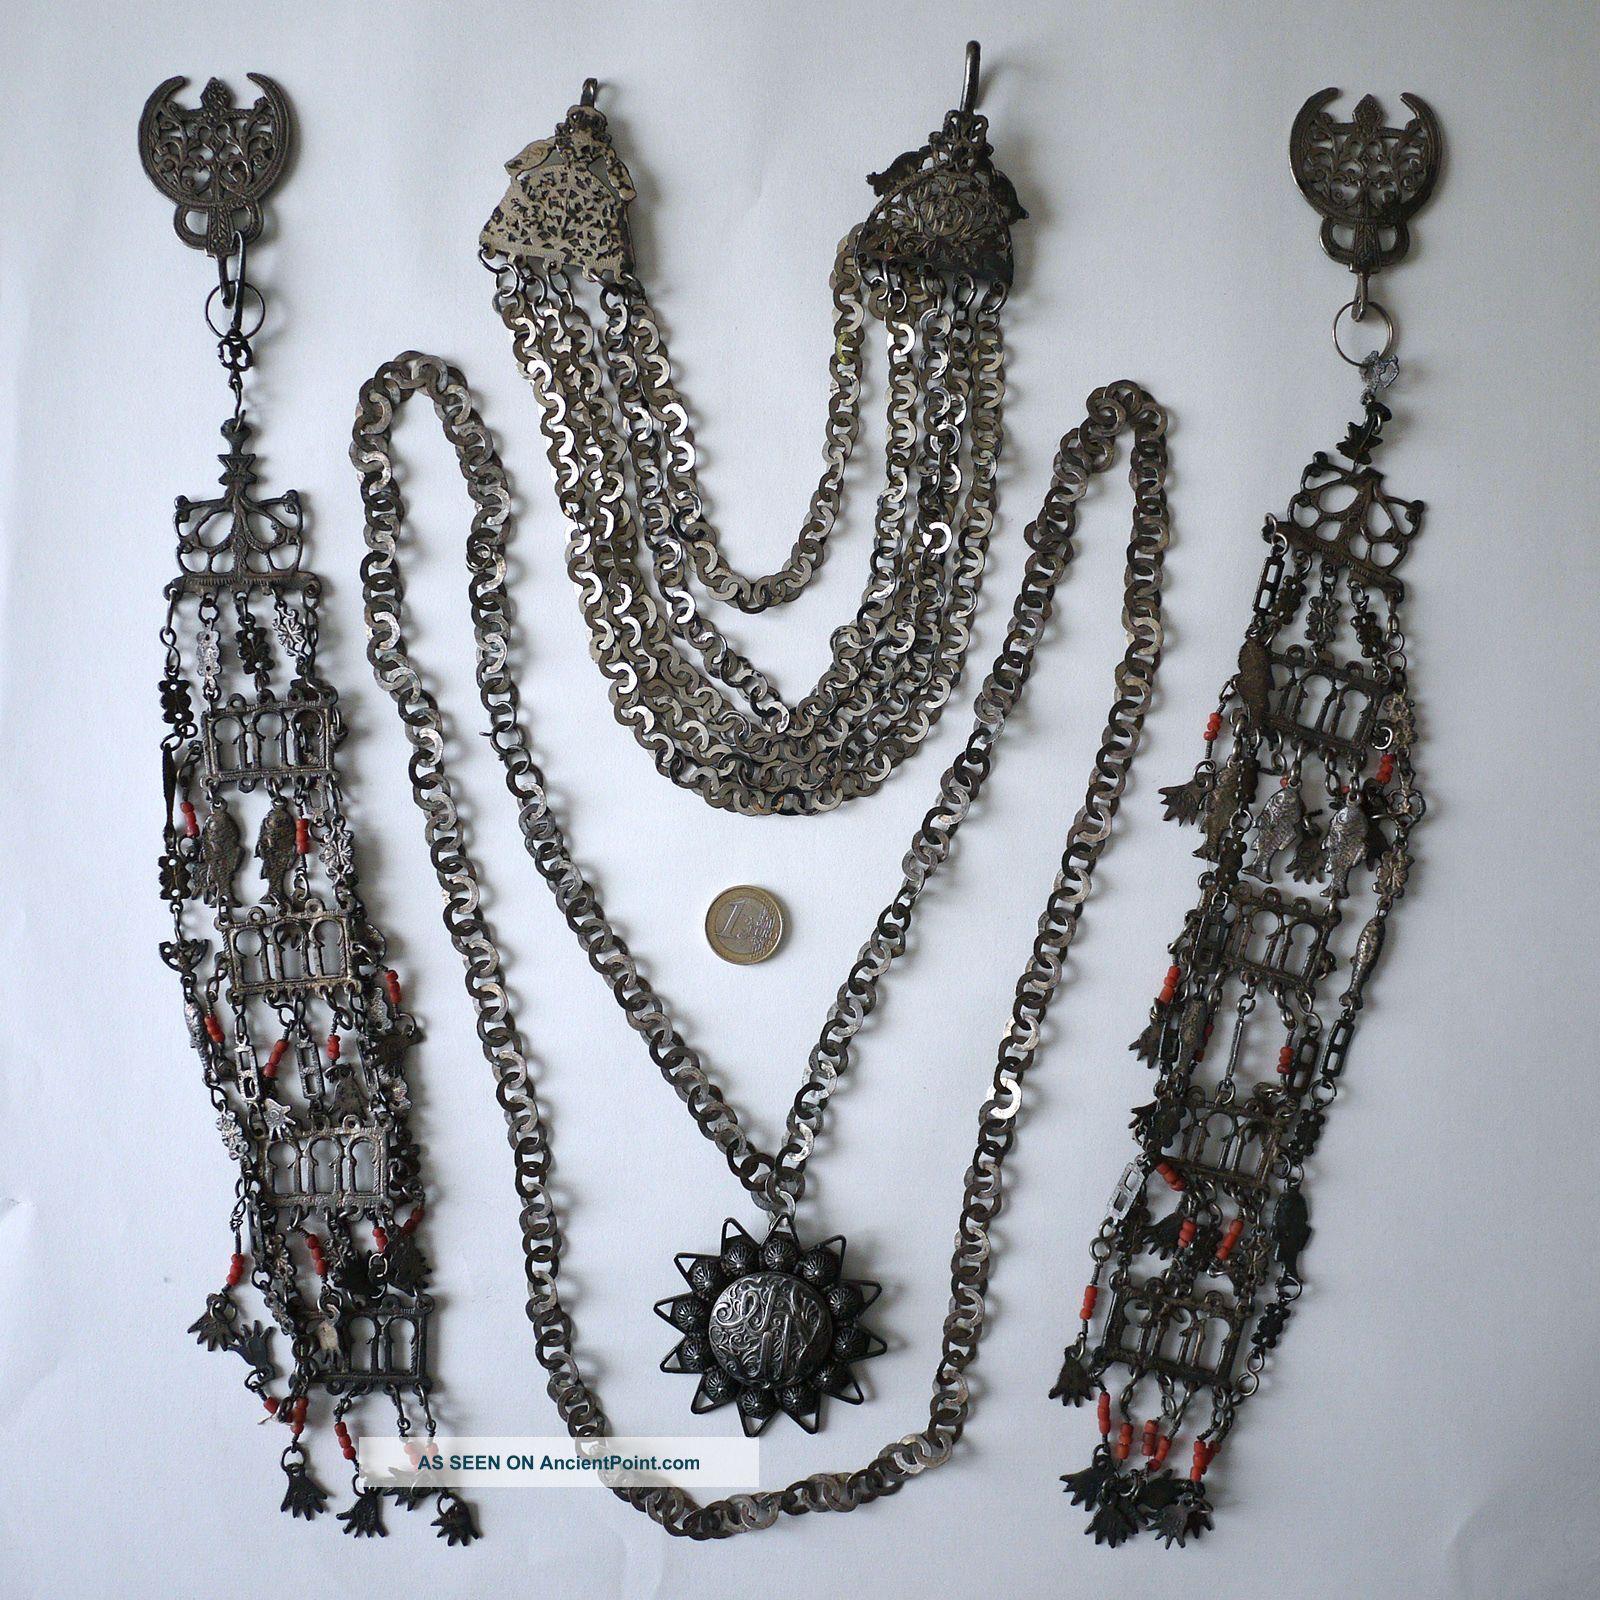 Tunisian Berber Women ' S Tribal Headdress/wedding Jewelry.  Silver,  Coral 1920 Jewelry photo